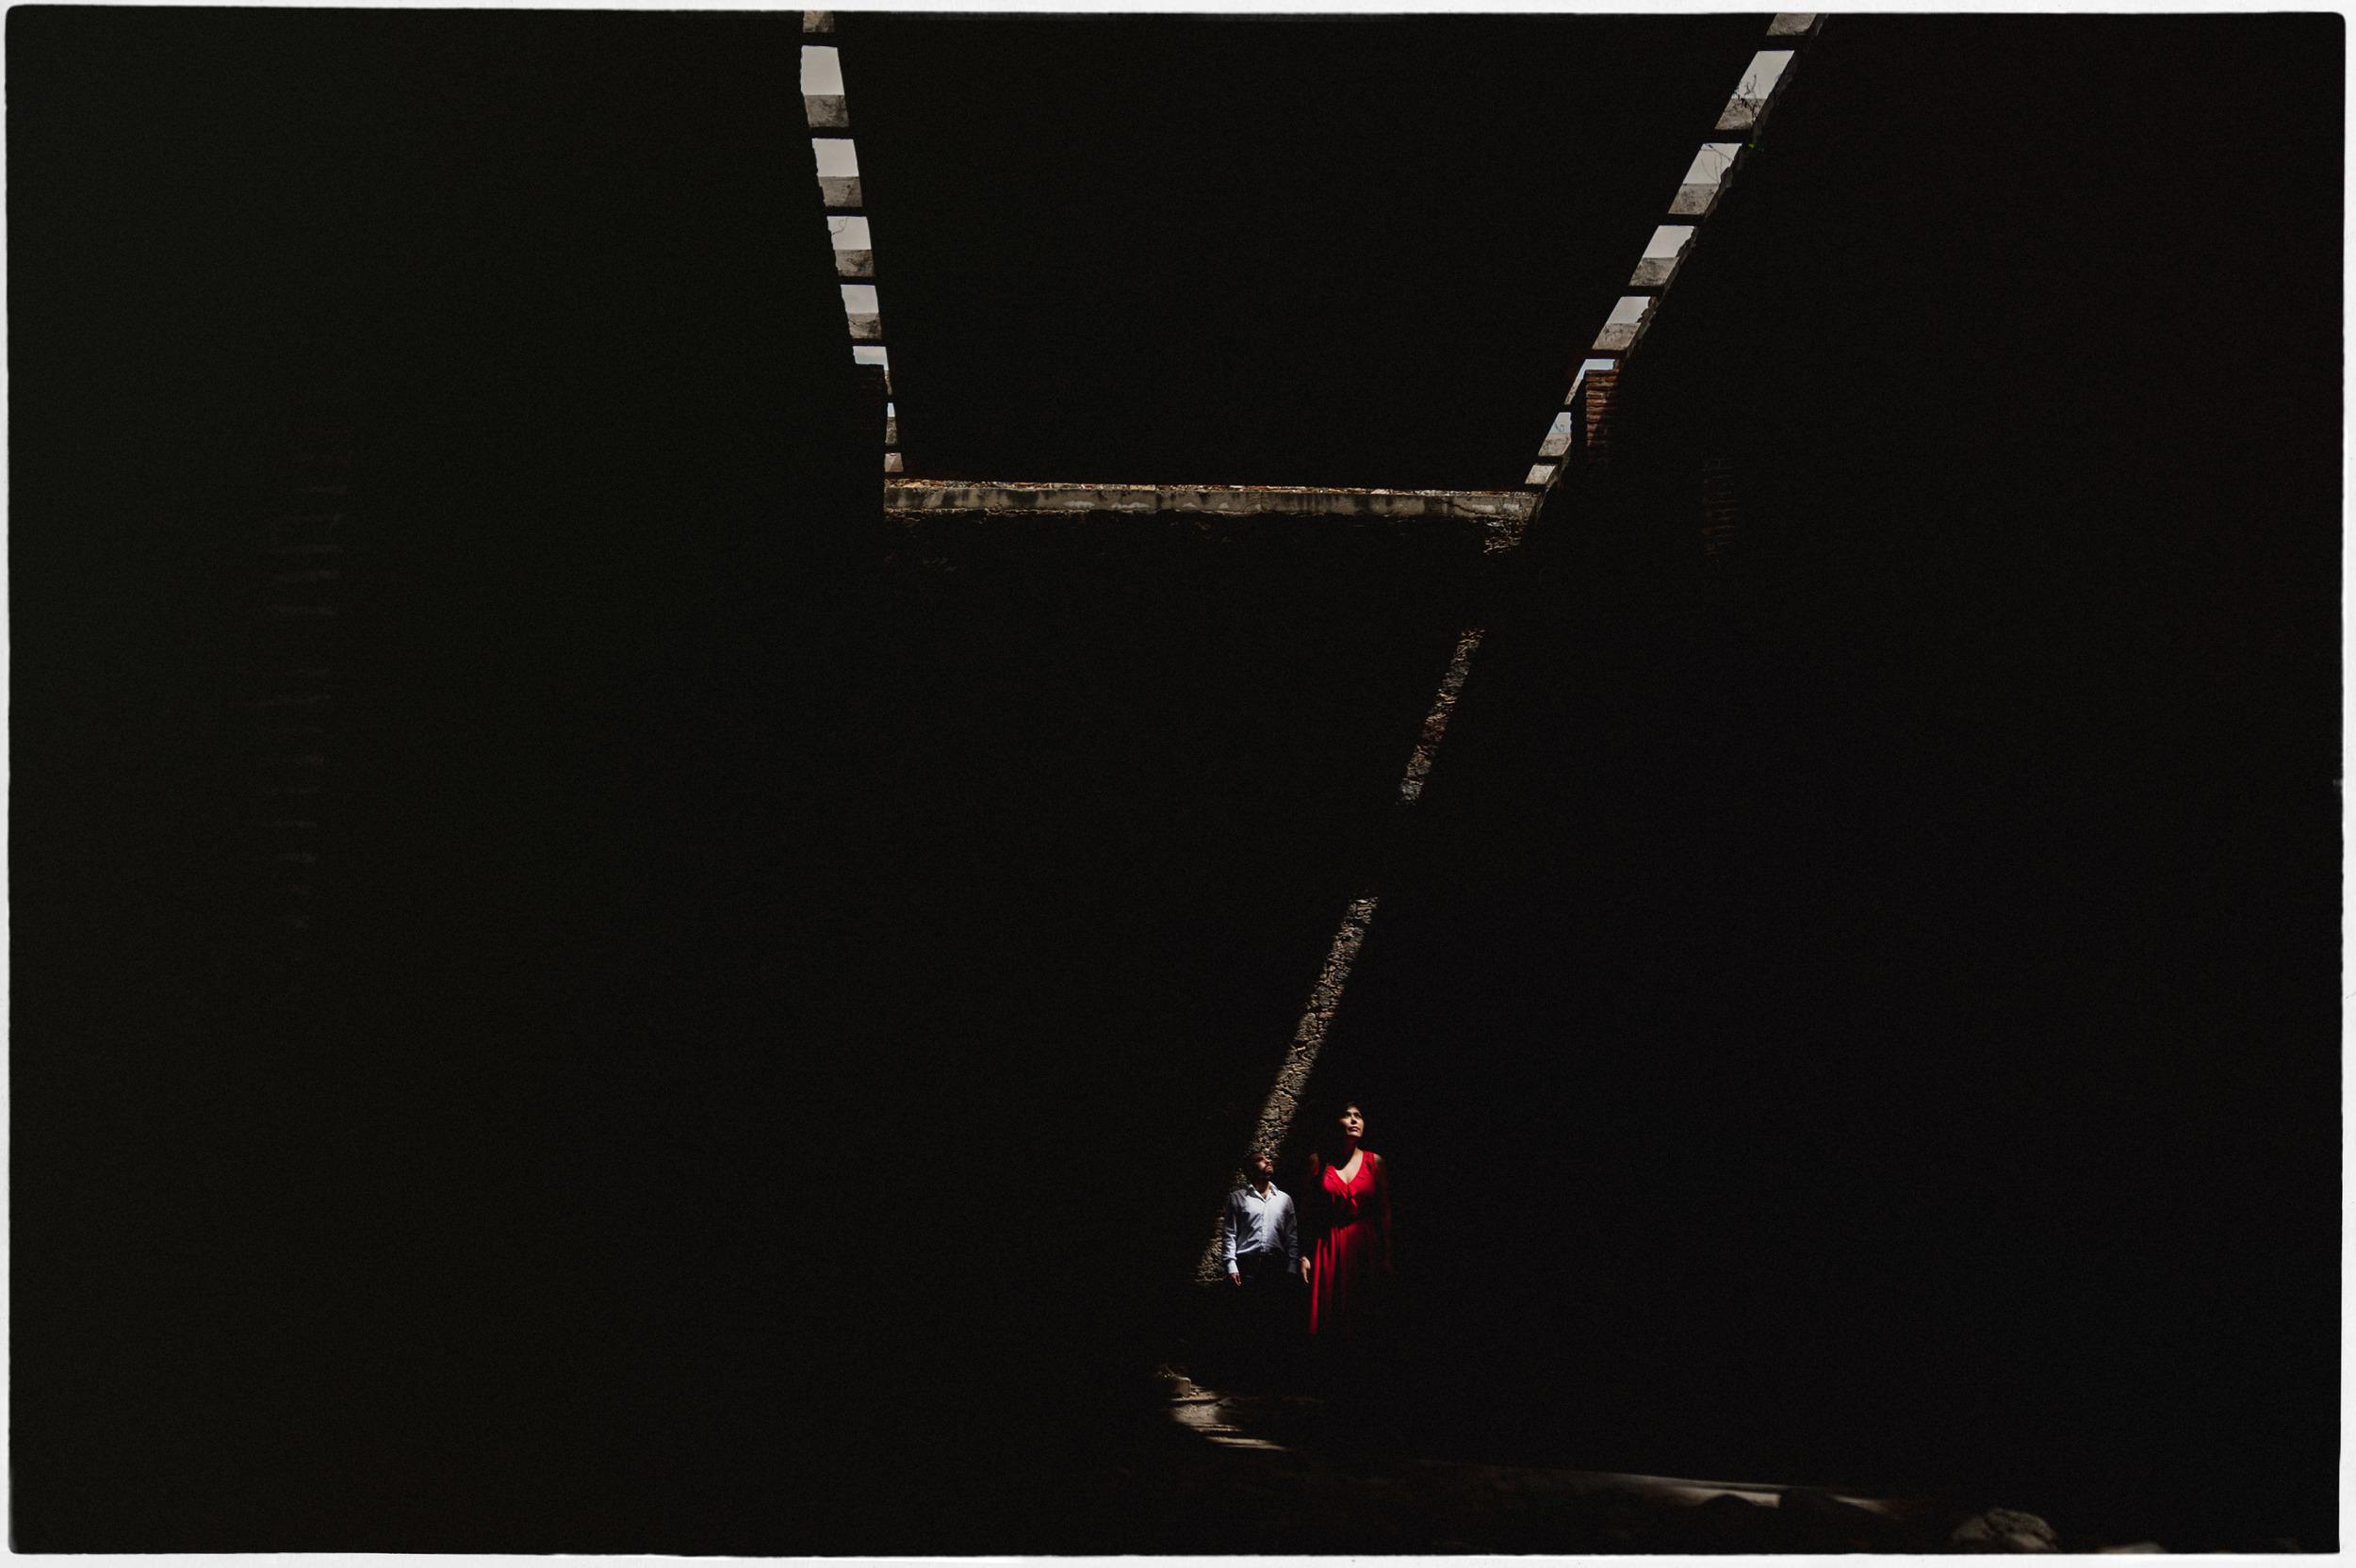 MaurizioSolisBroca.Photography20150327DSC09849-Edit.jpg